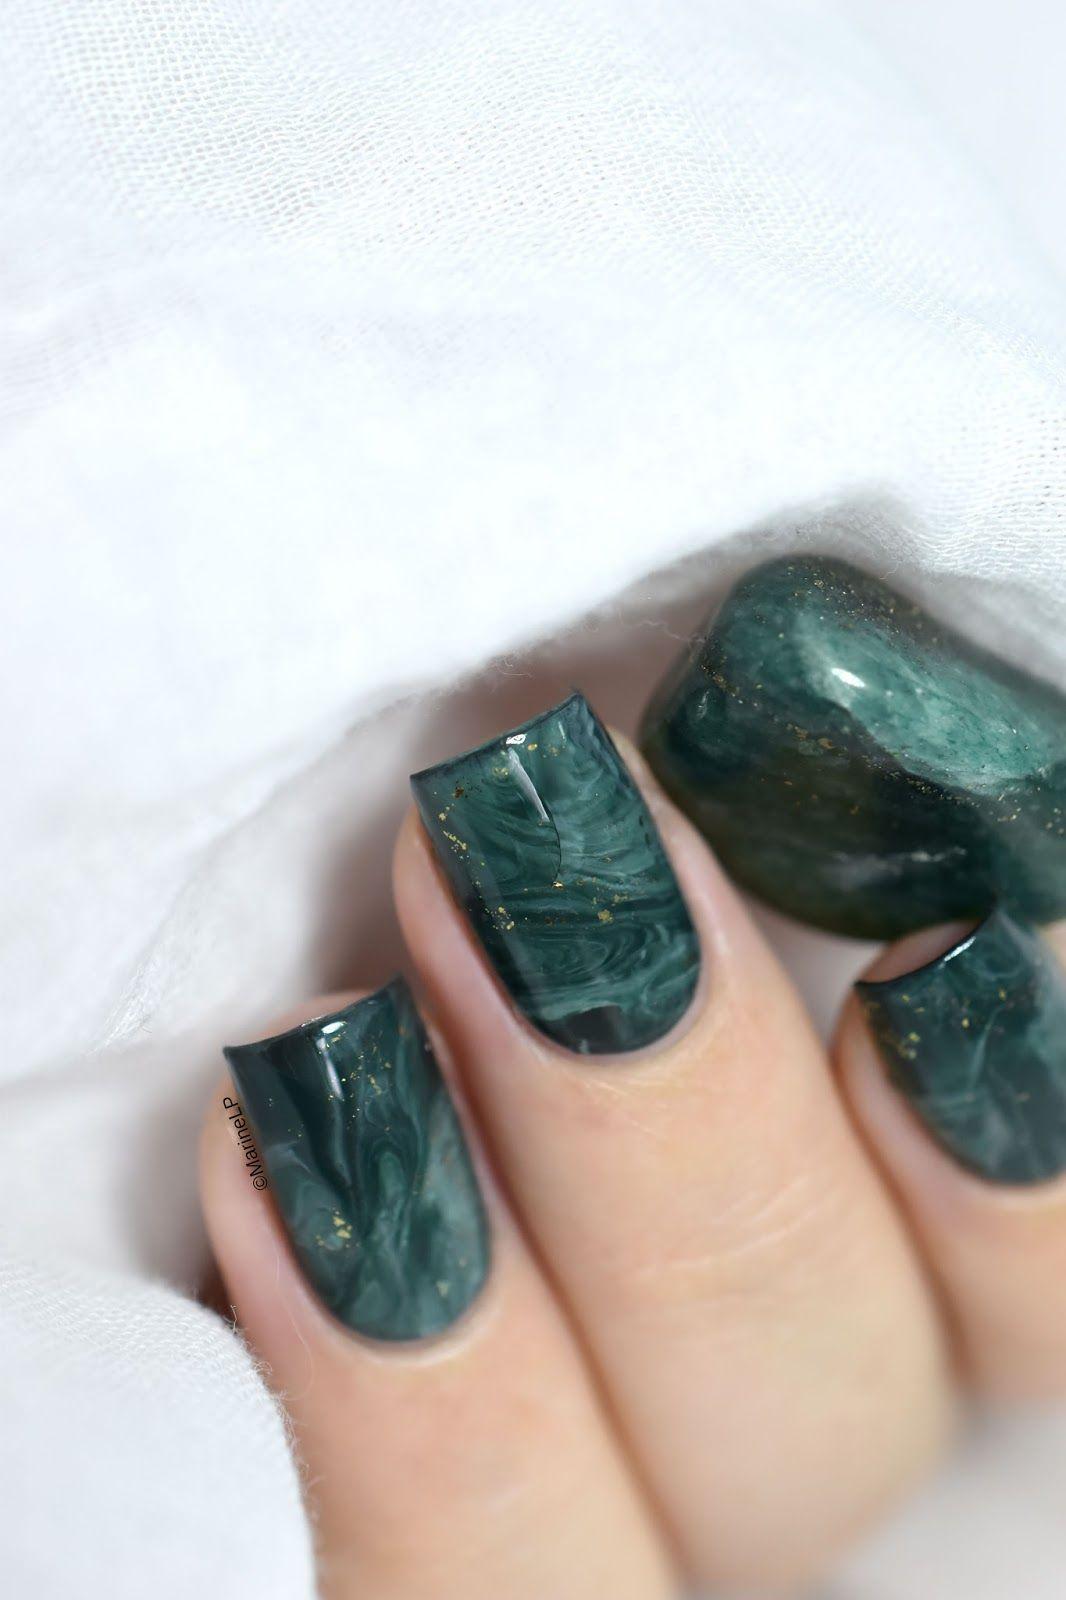 Nailstorming Objet De Dco Stone Marble Nail Art Video Tutorial